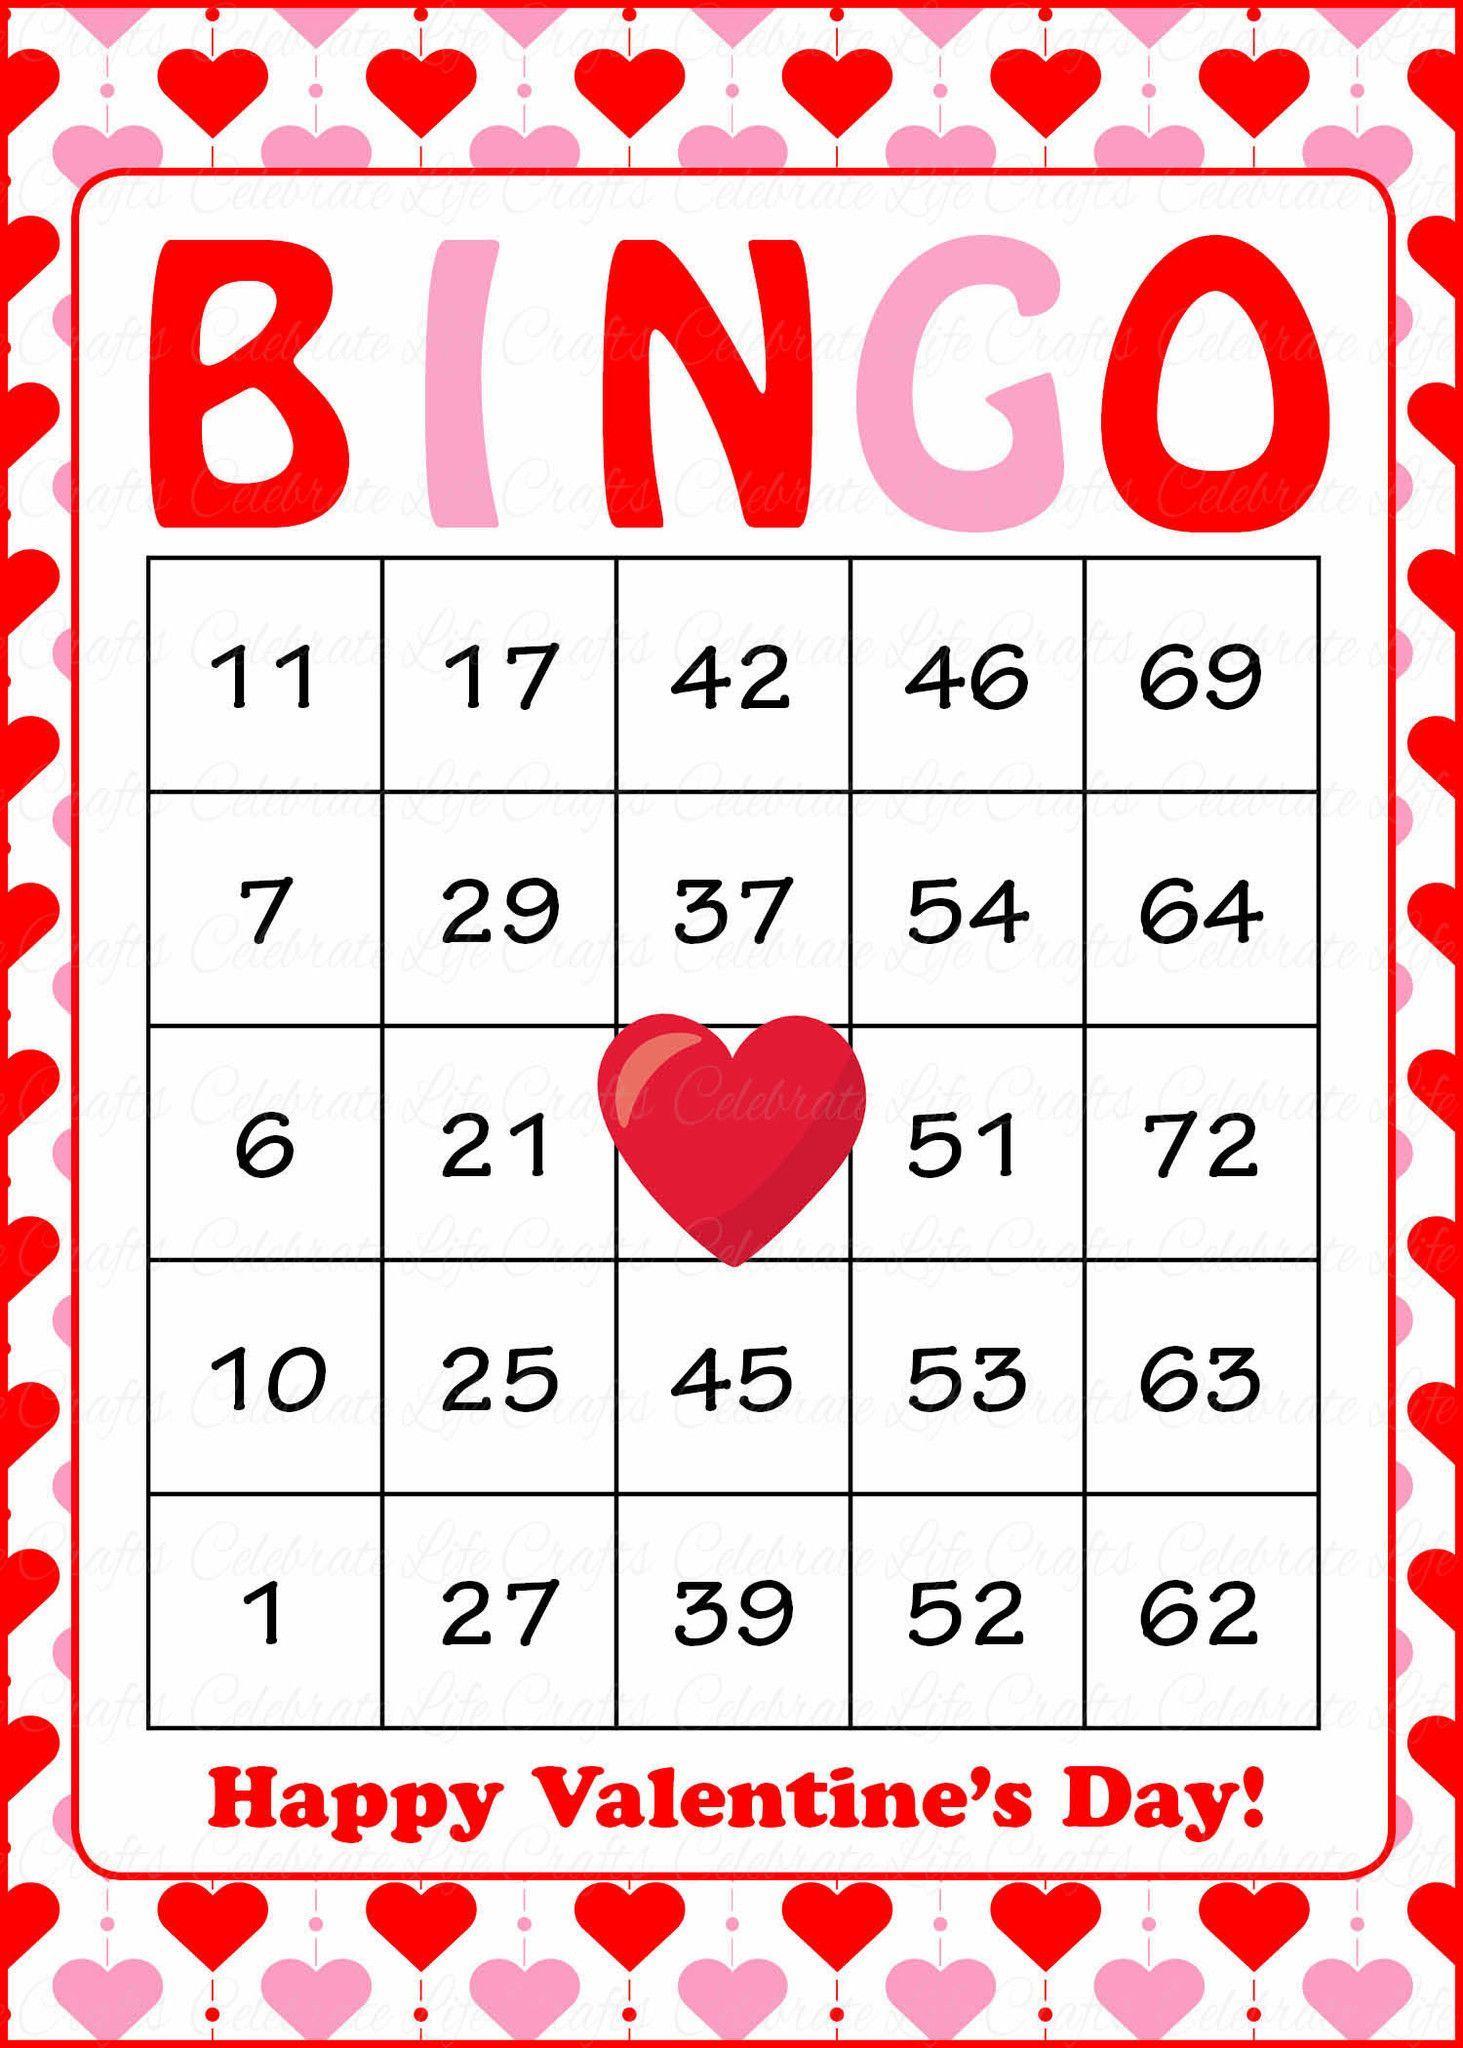 Valentine's Bingo Cards - Printable Download - Prefilled - Free Printable Bingo Cards Random Numbers